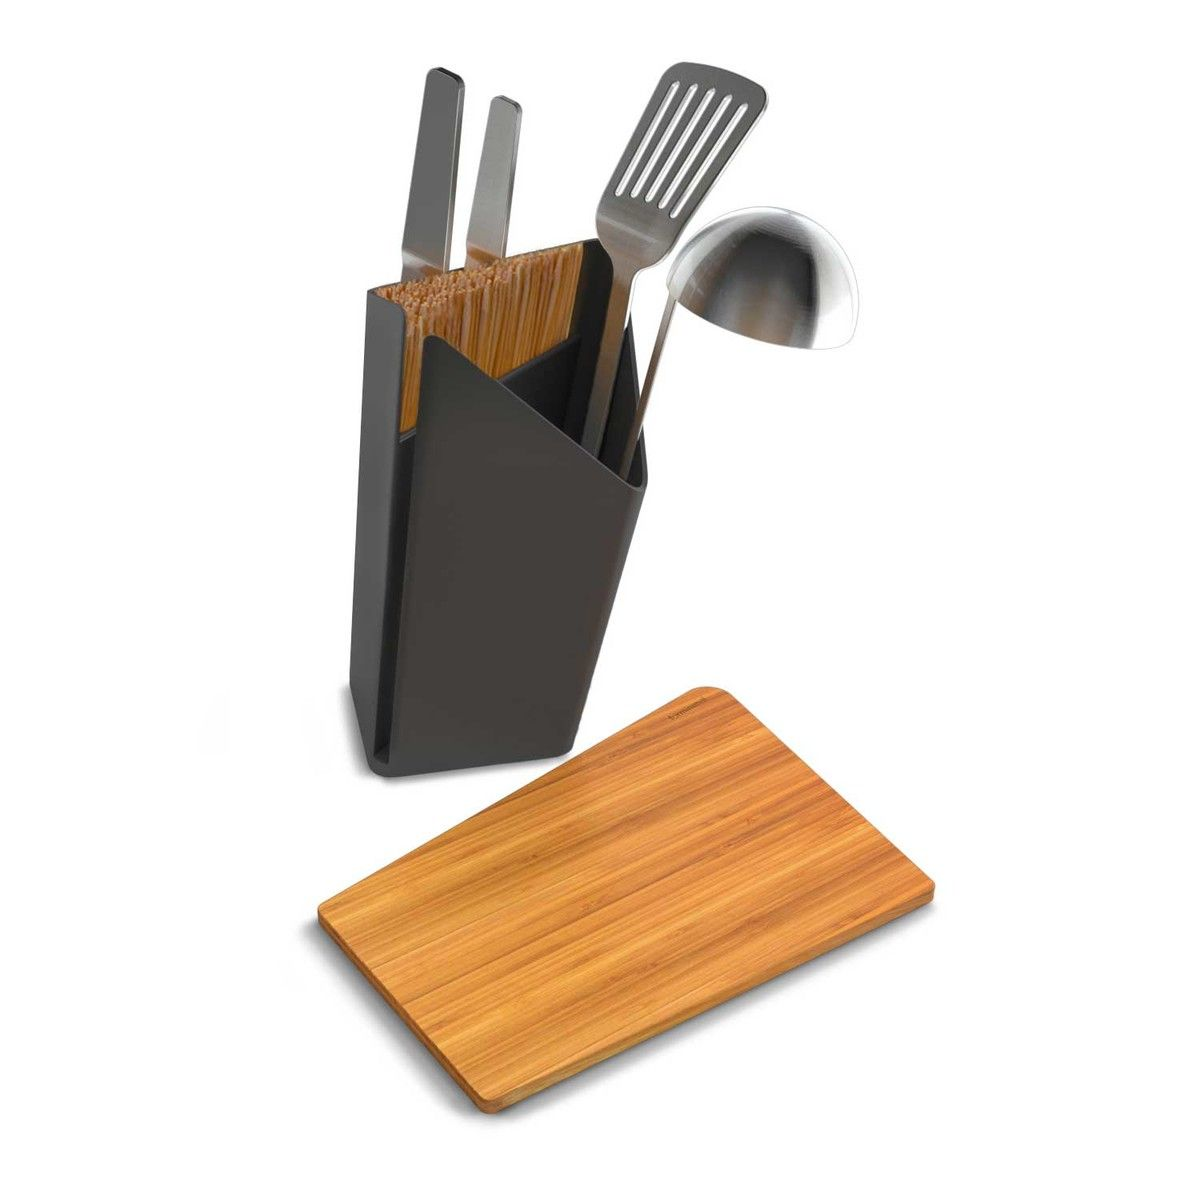 carousel steun keuken : Pin By Ariel On Product Design Pinterest Knife Holder And